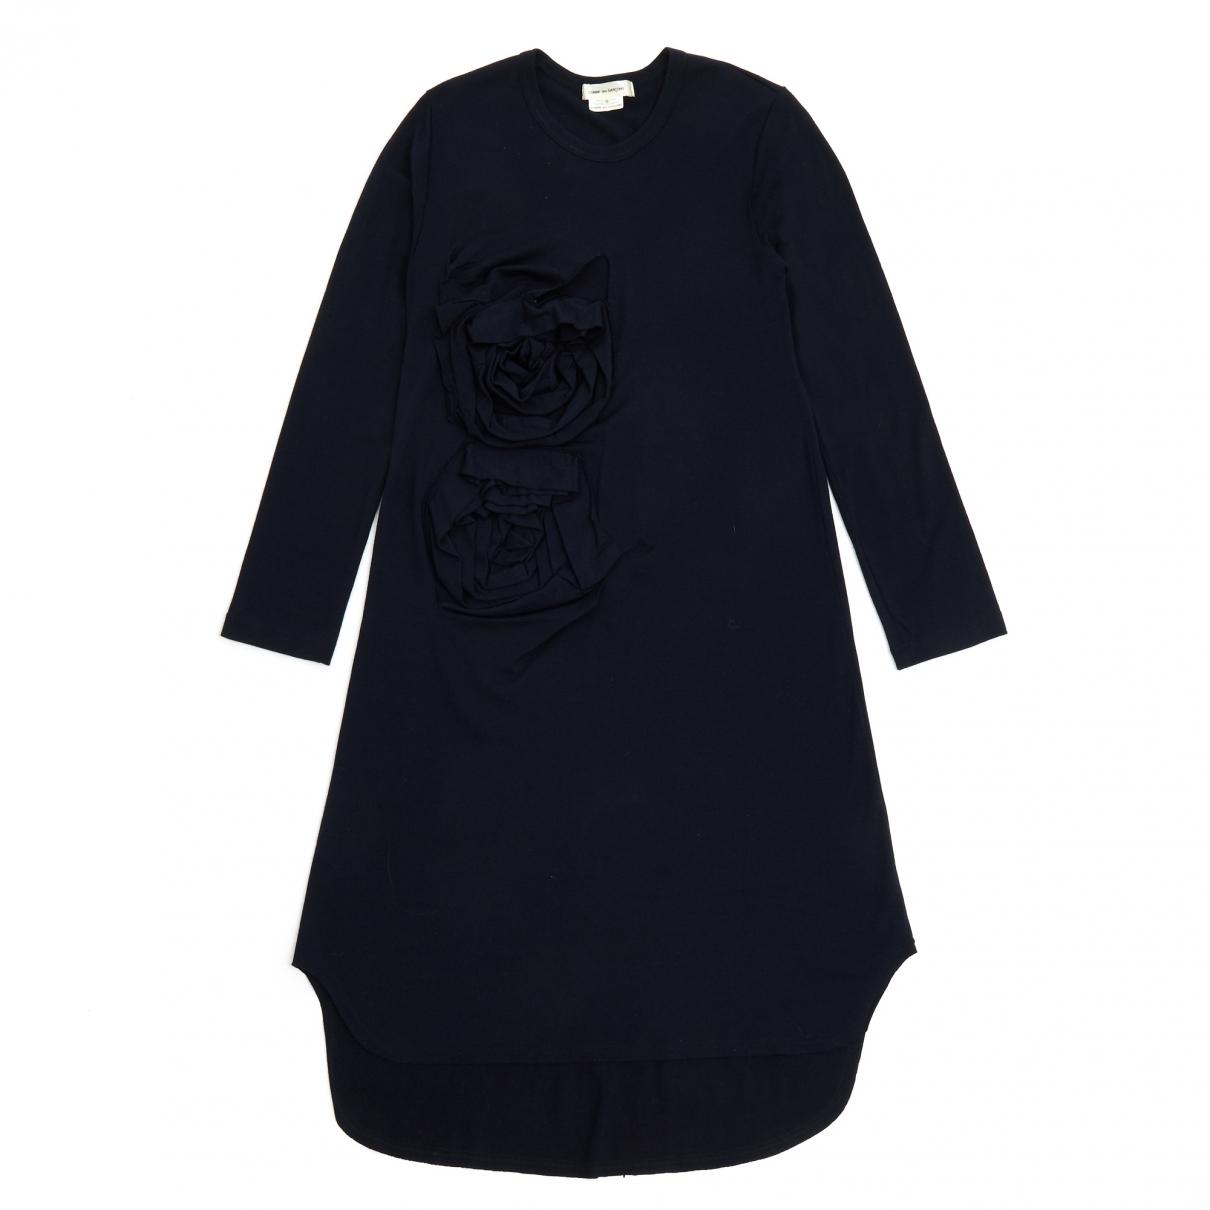 Comme Des Garcons \N Navy Wool dress for Women S International